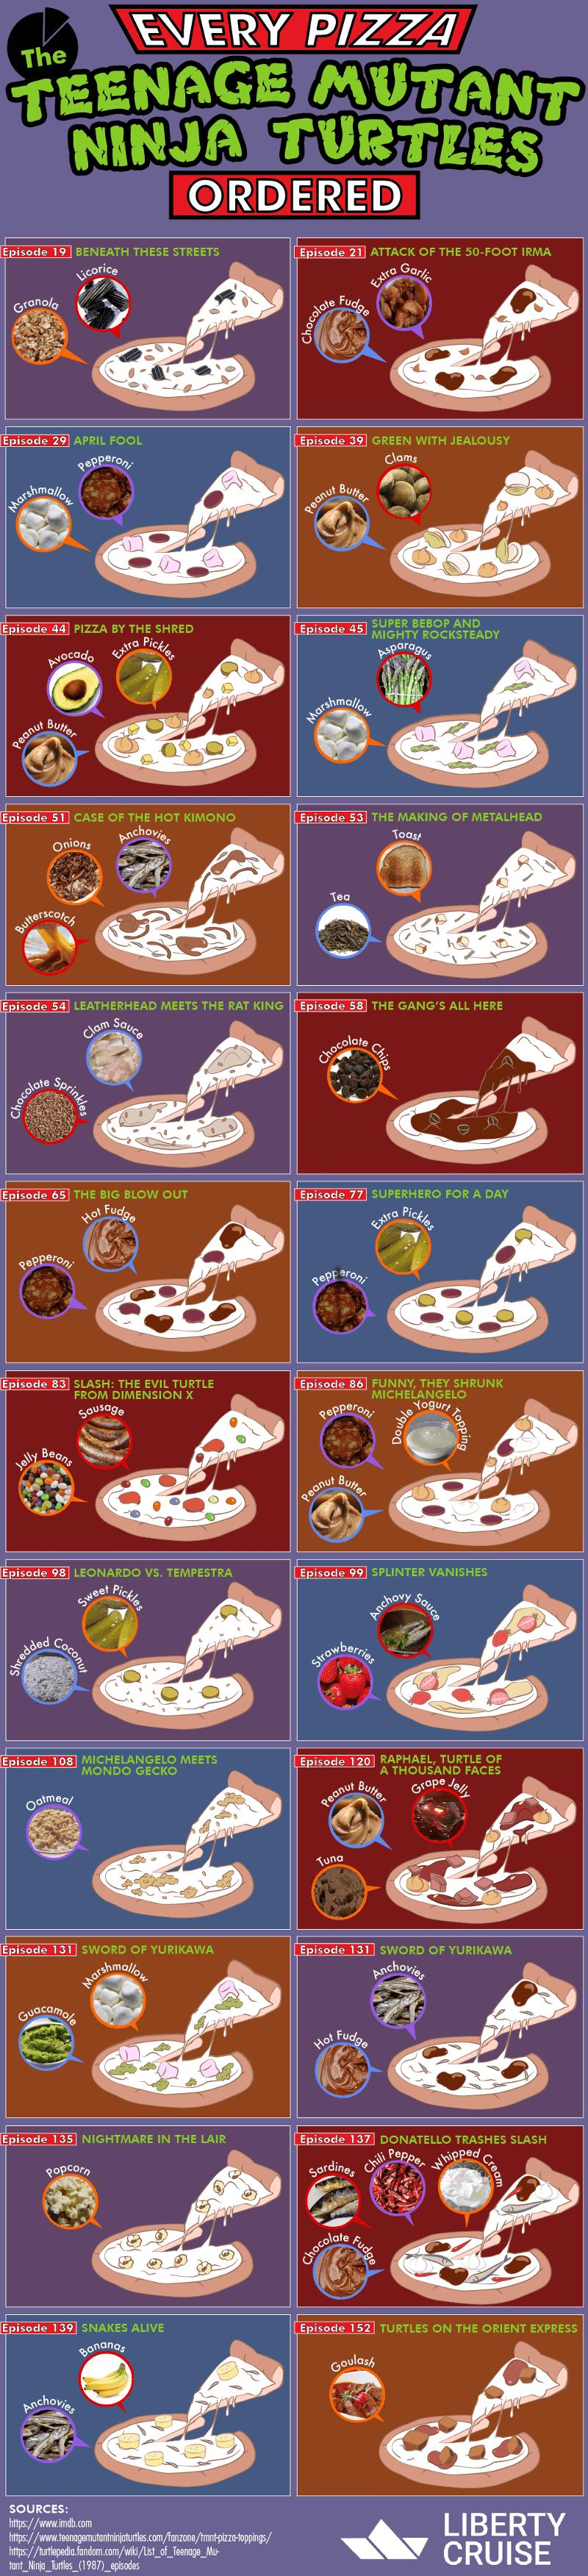 Every pizza the ninja turtles ordered